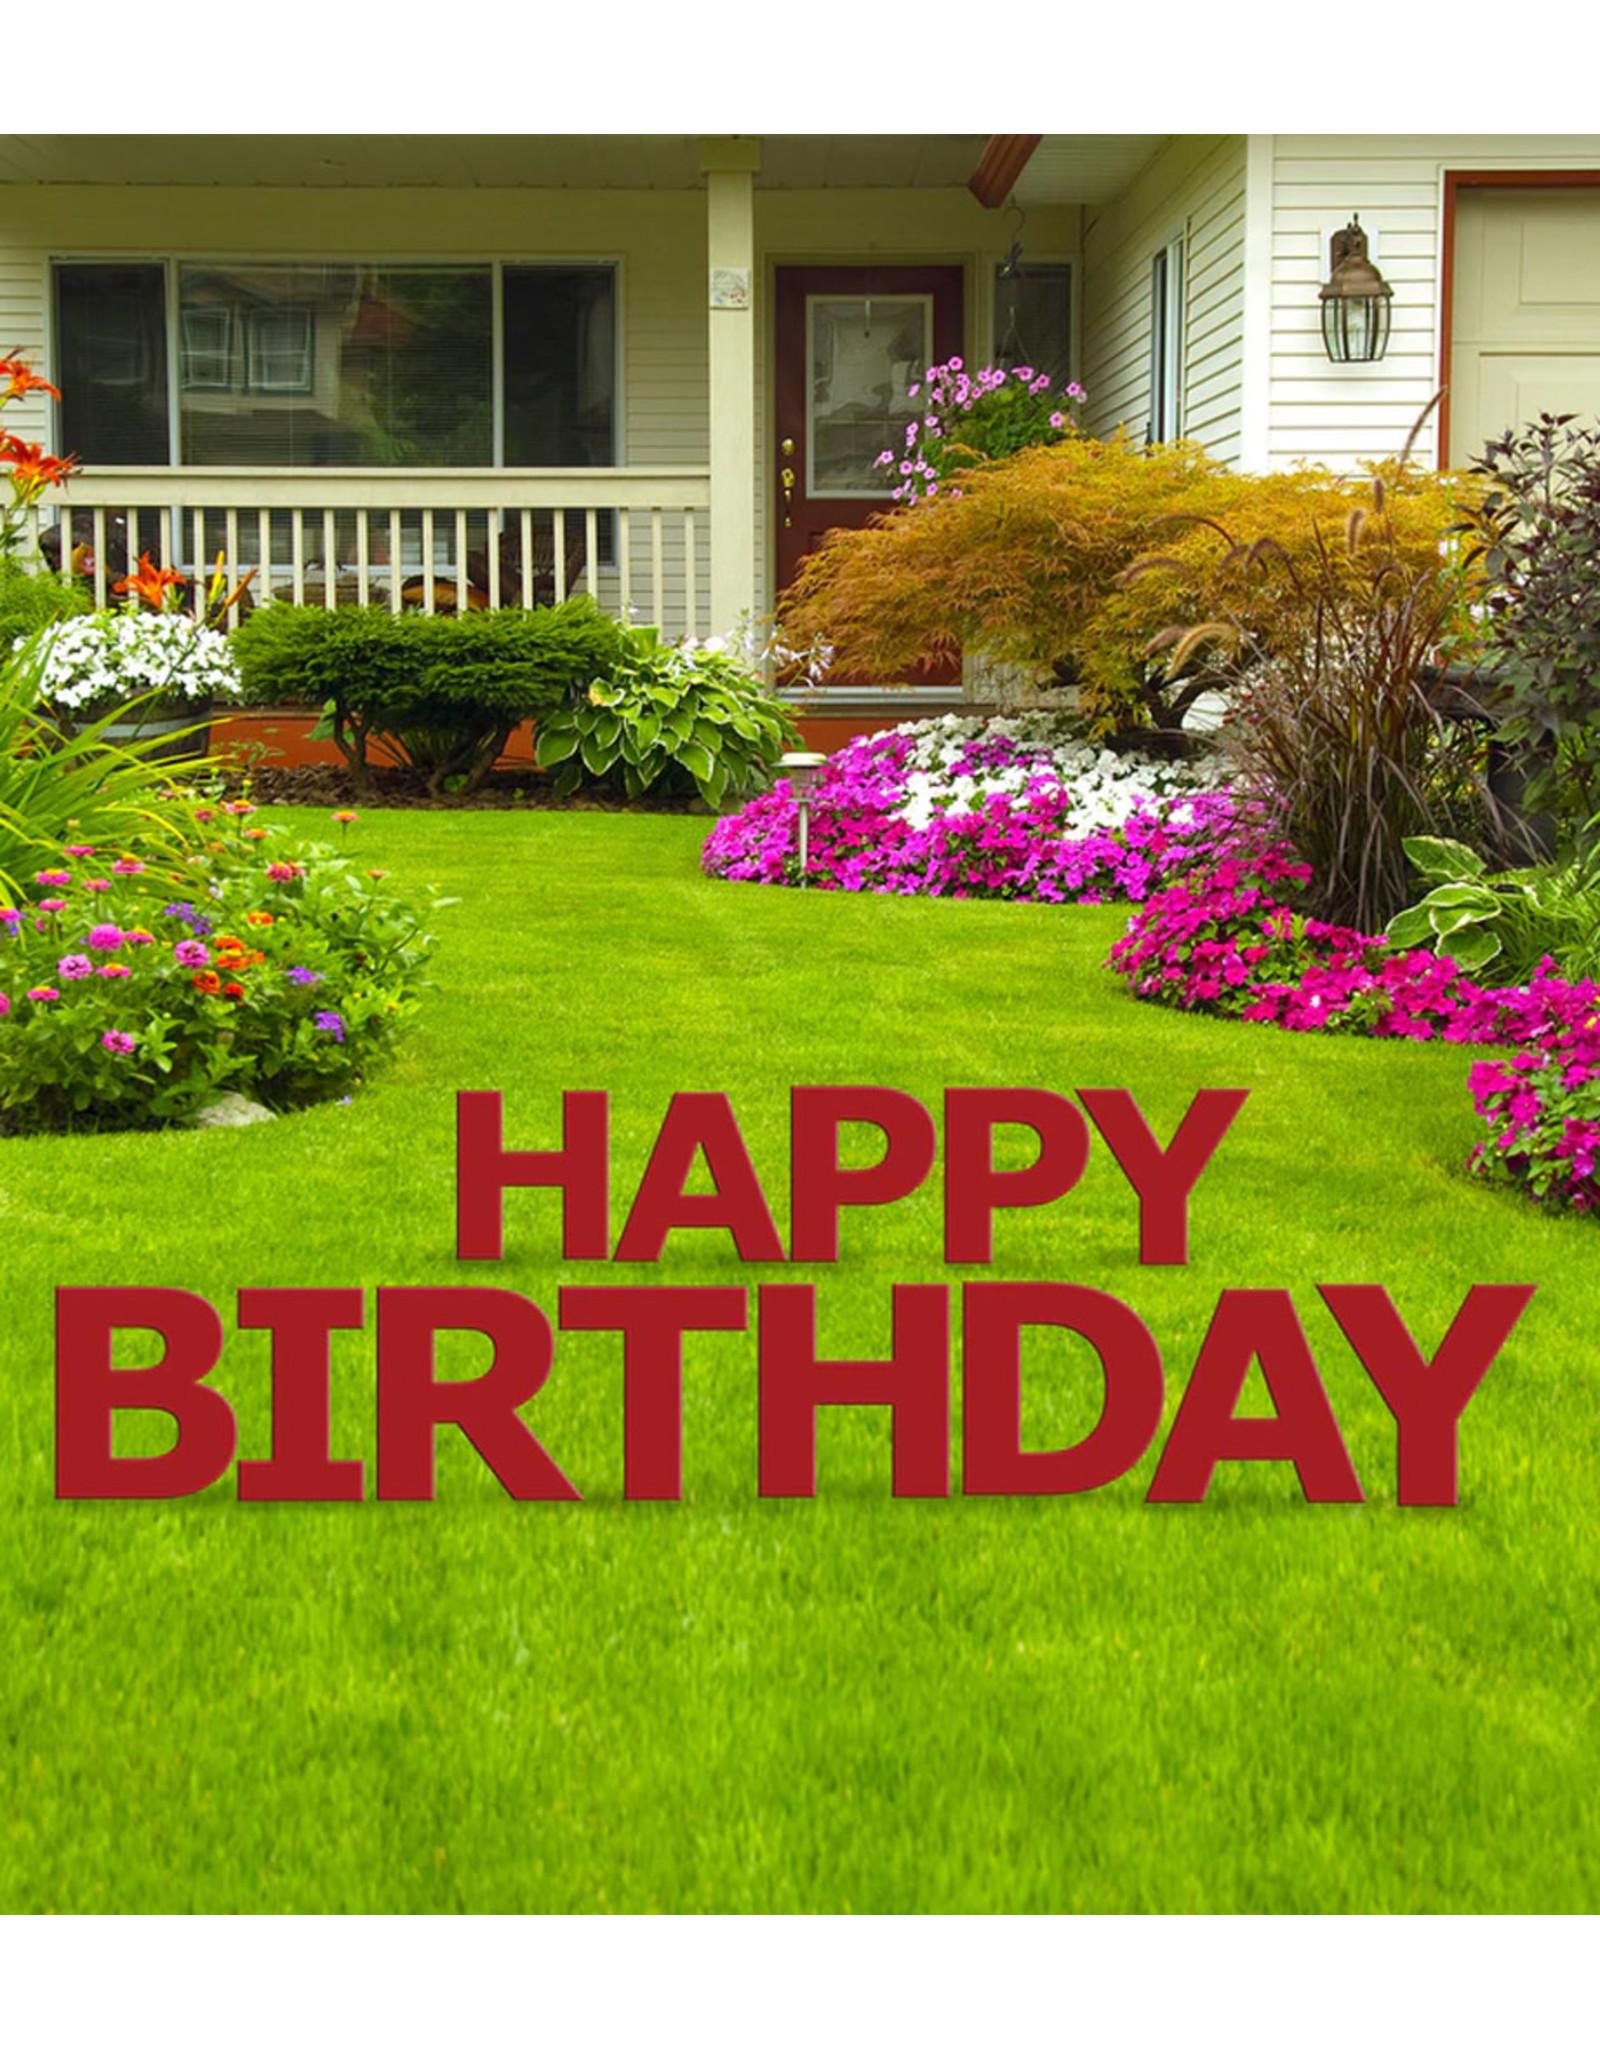 Happy Birthday Red Yard Signs